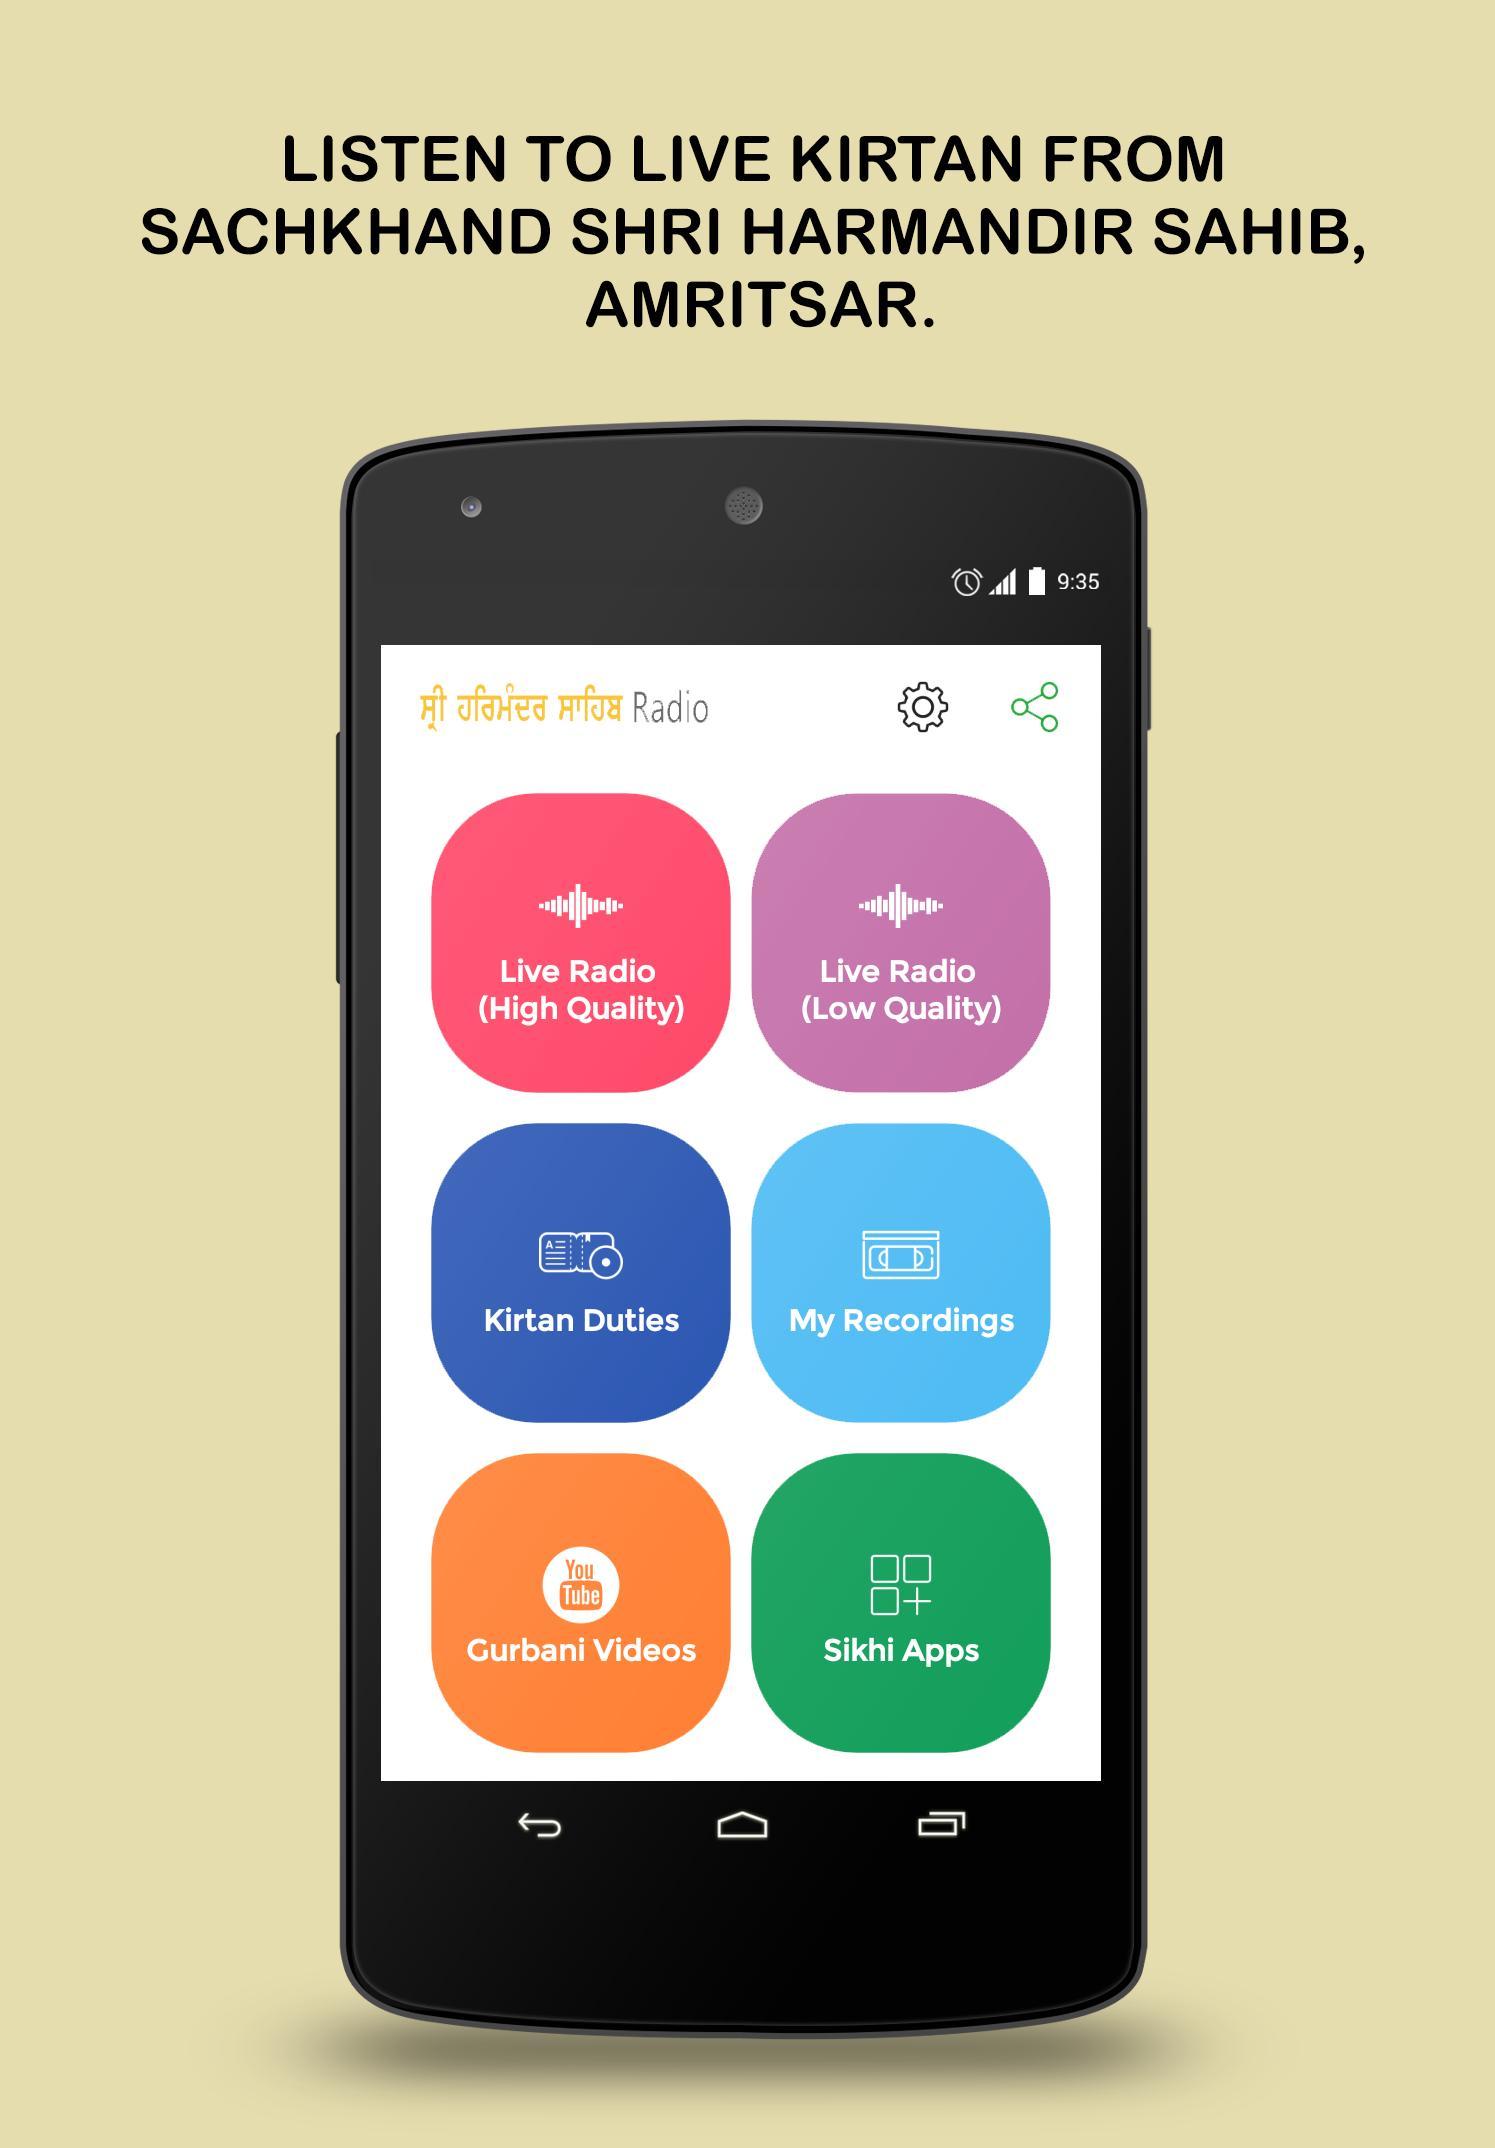 Harmandir Sahib Radio for Android - APK Download